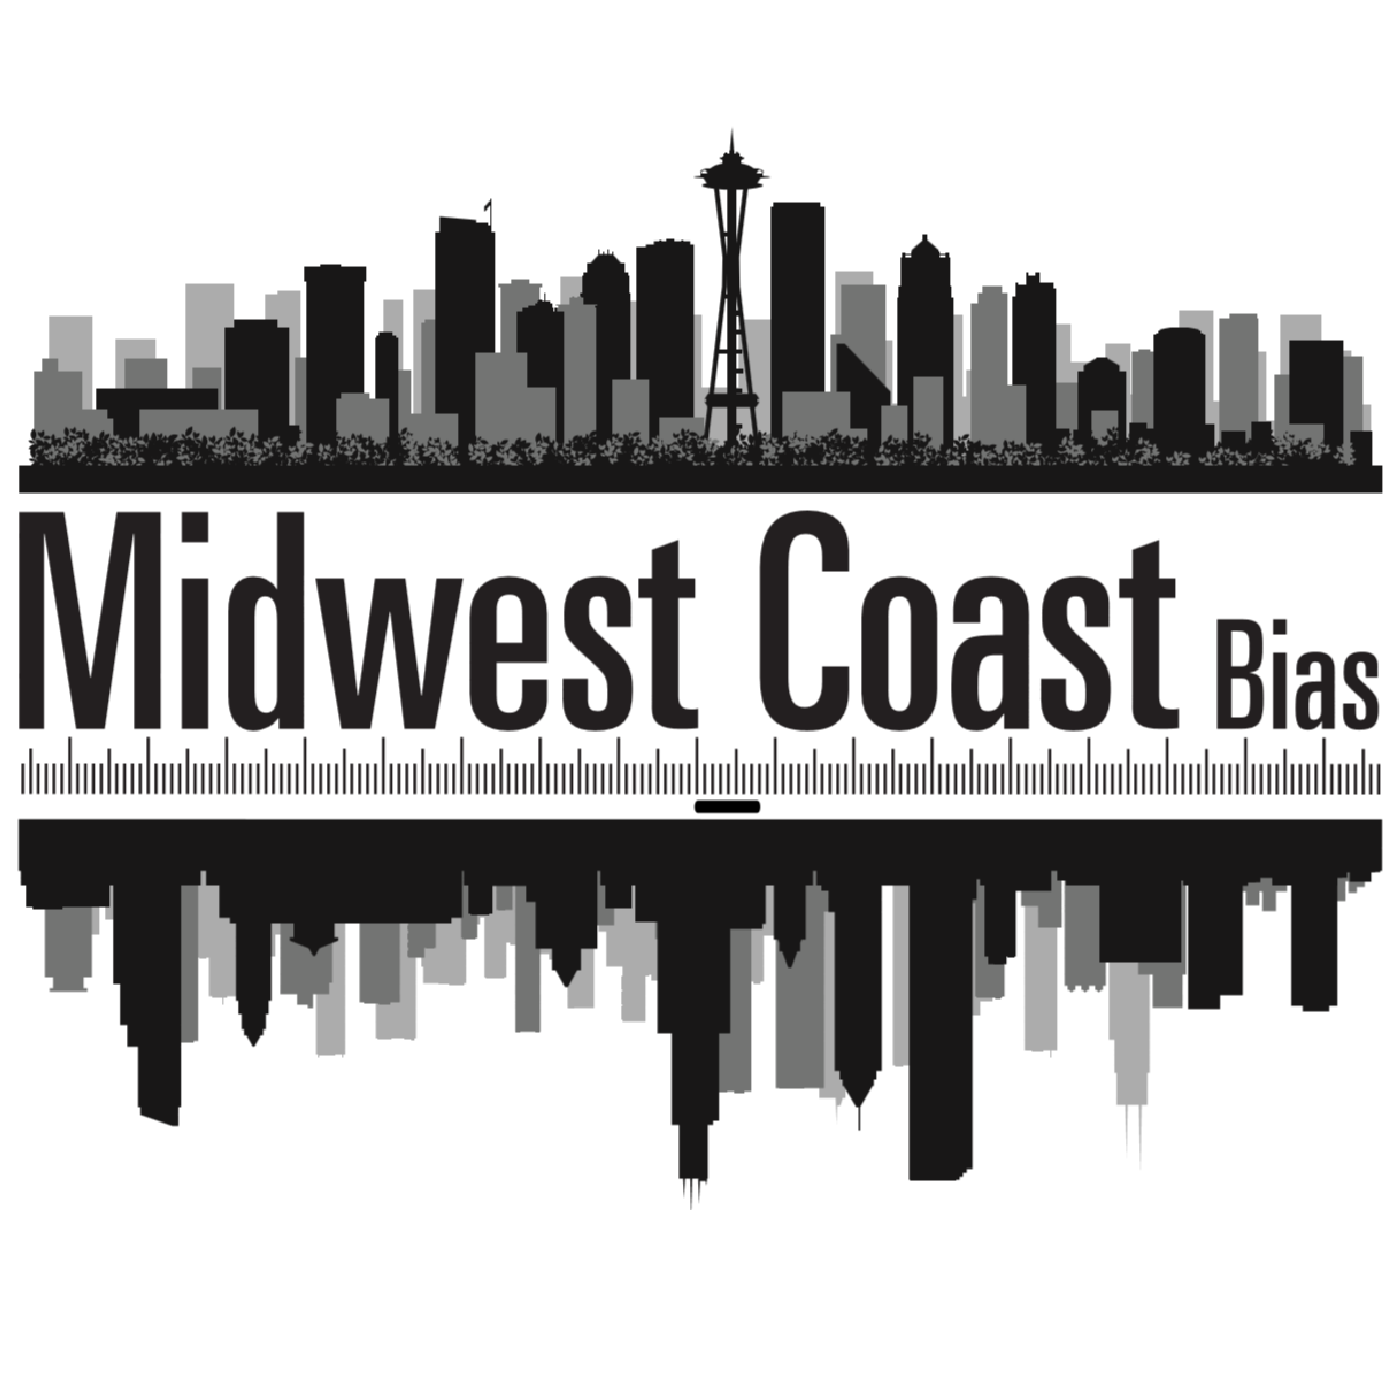 Midwest Coast Bias